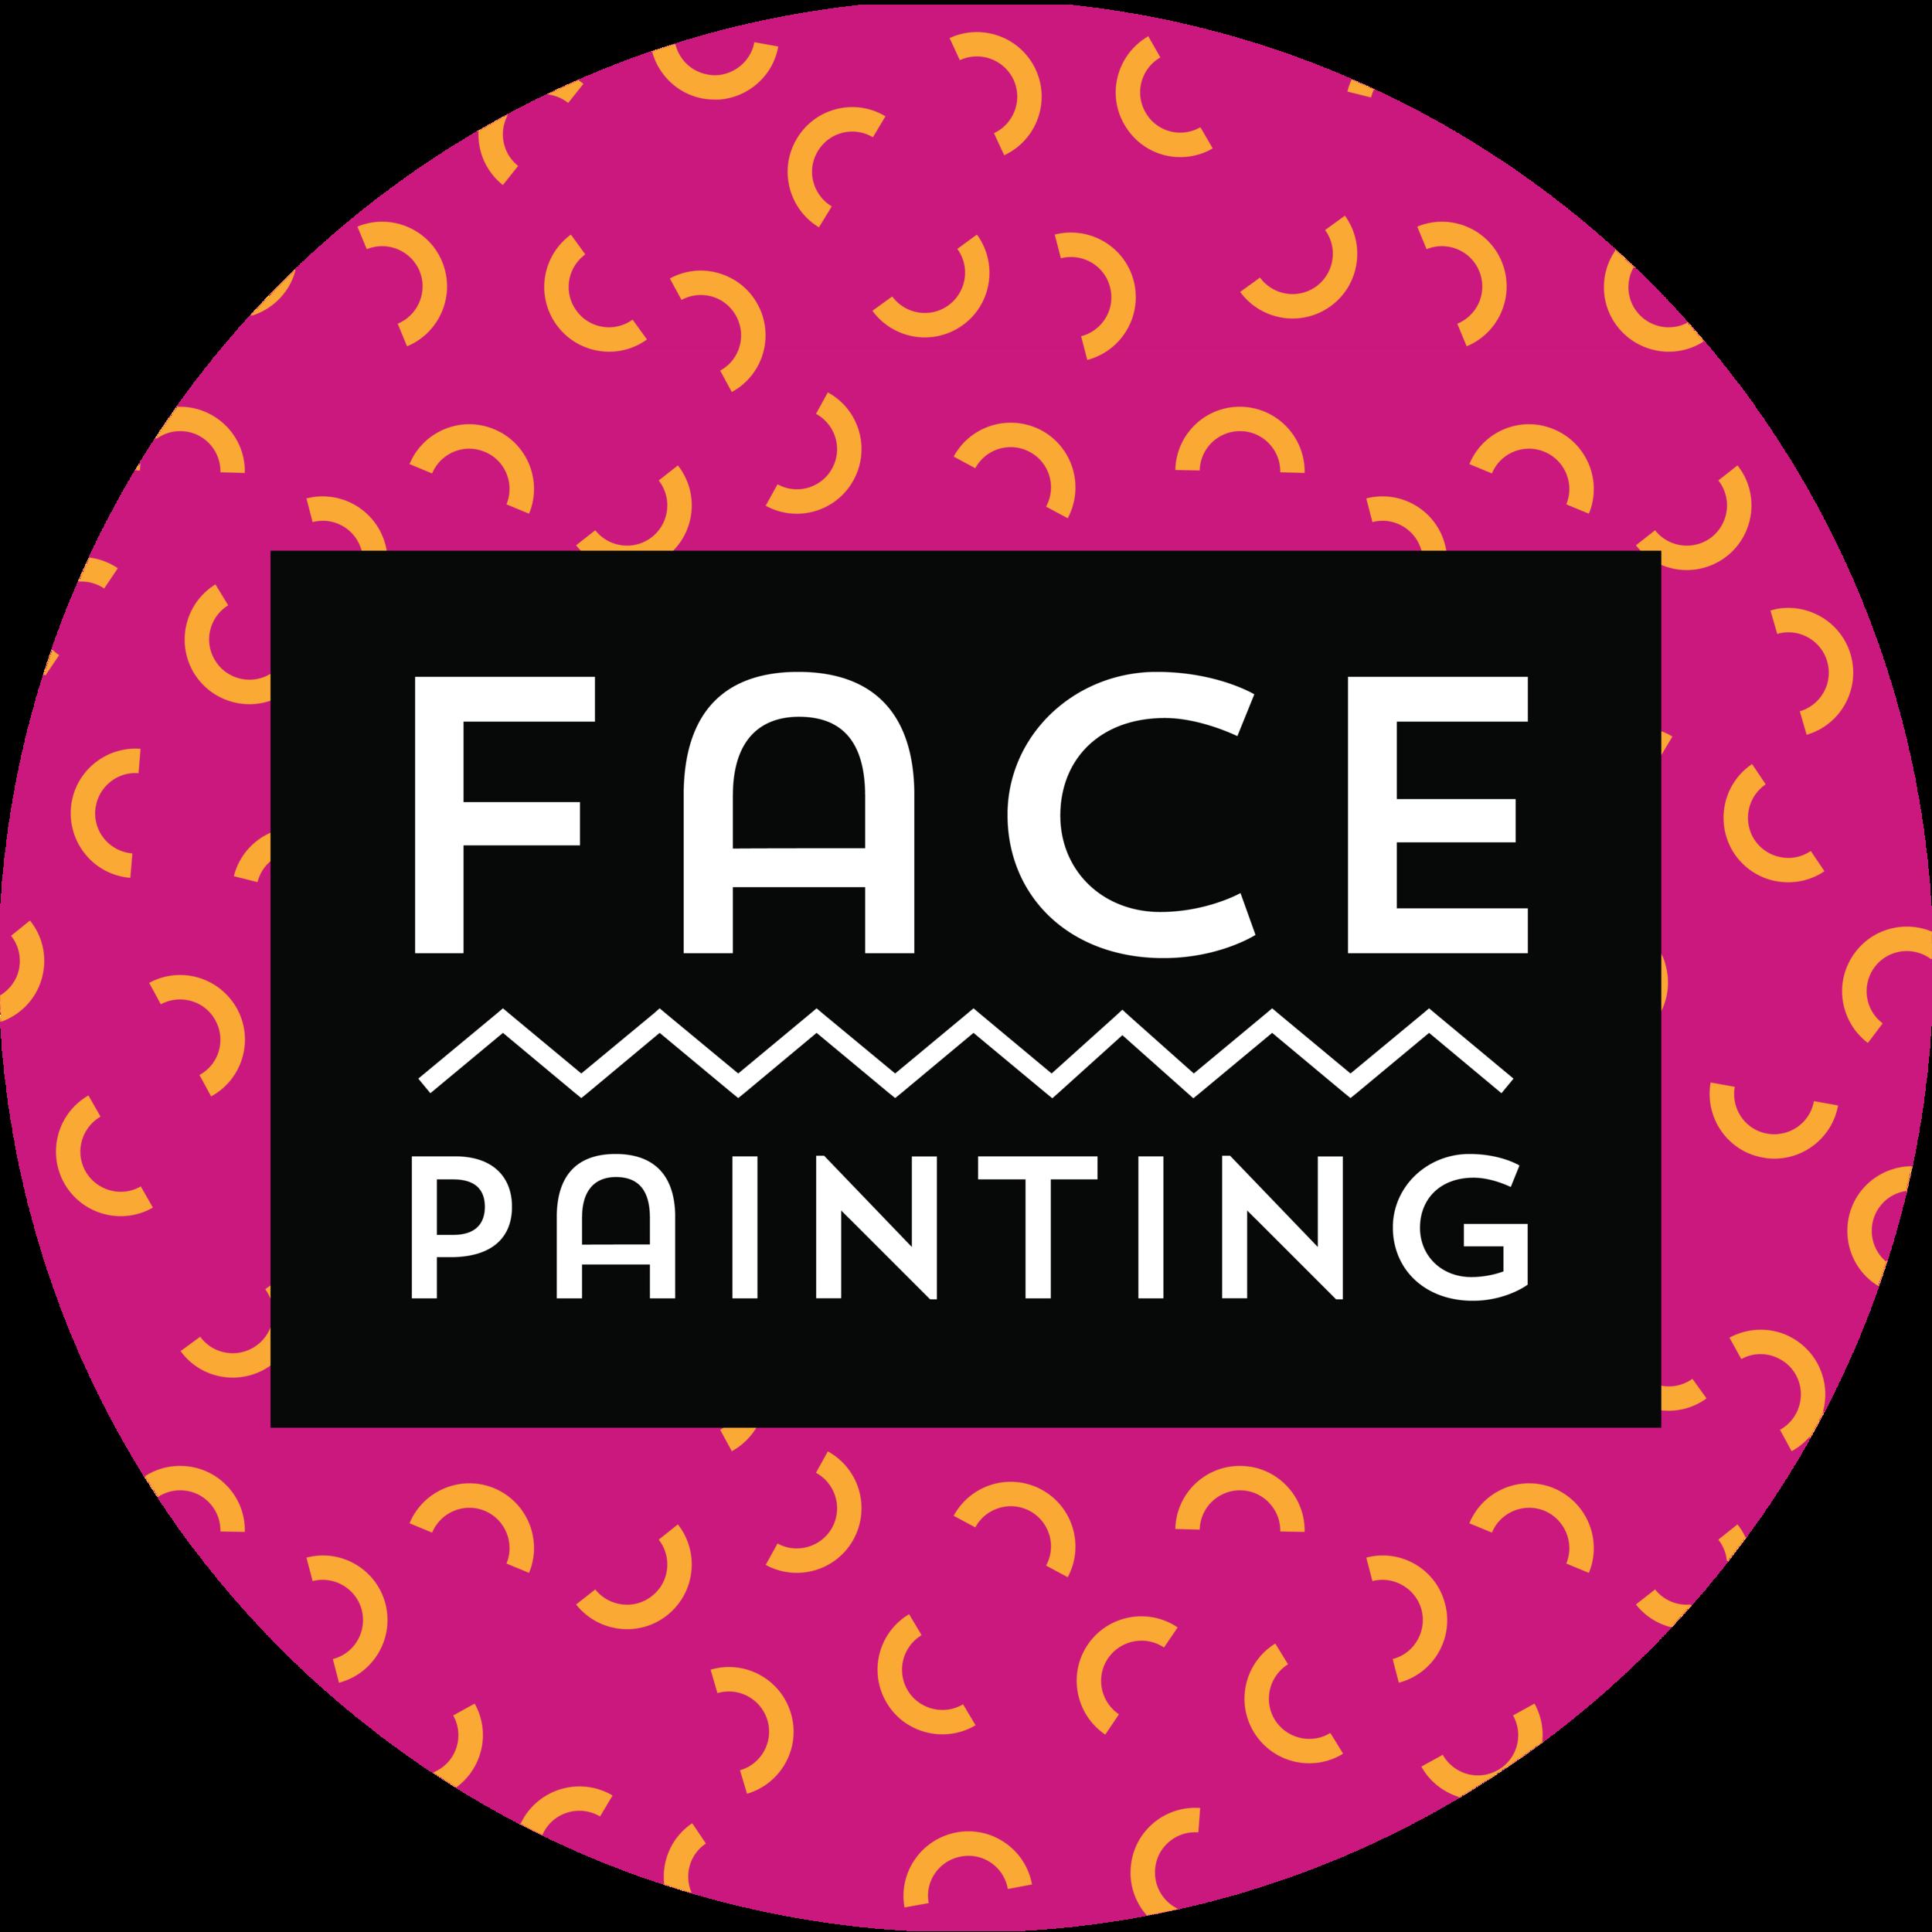 Face Painting Lollipop Sign.png